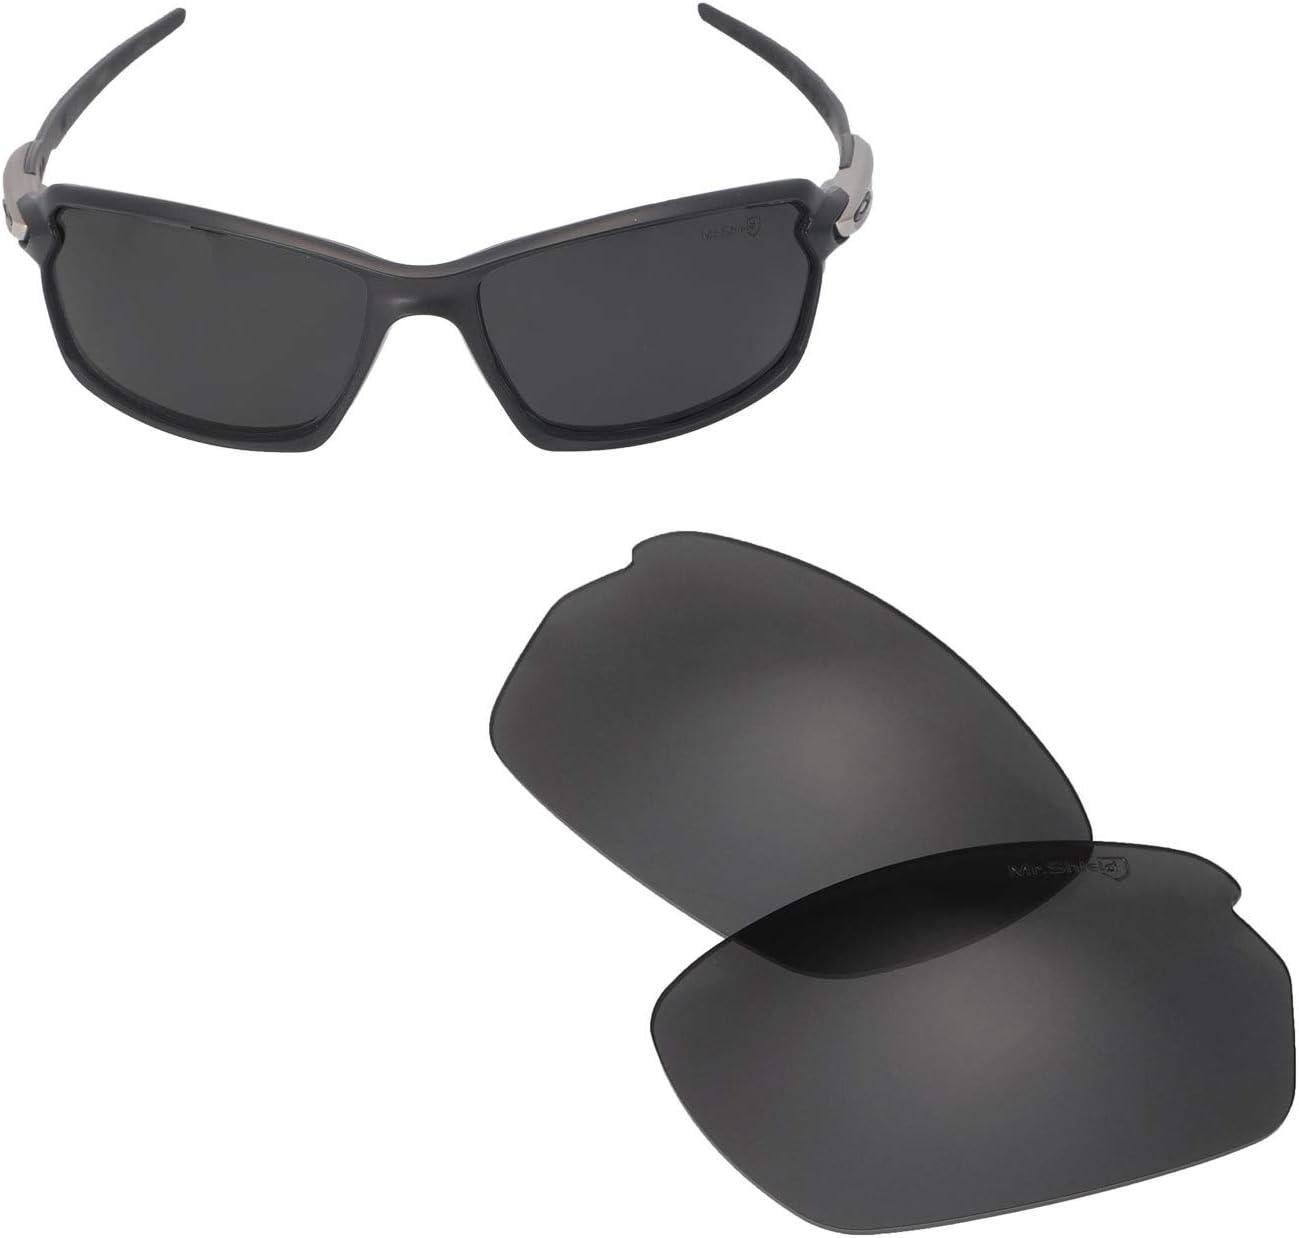 Walleva Replacement Max 46% OFF Lenses Regular discount for Oakley - Carbon Sunglasses Shift